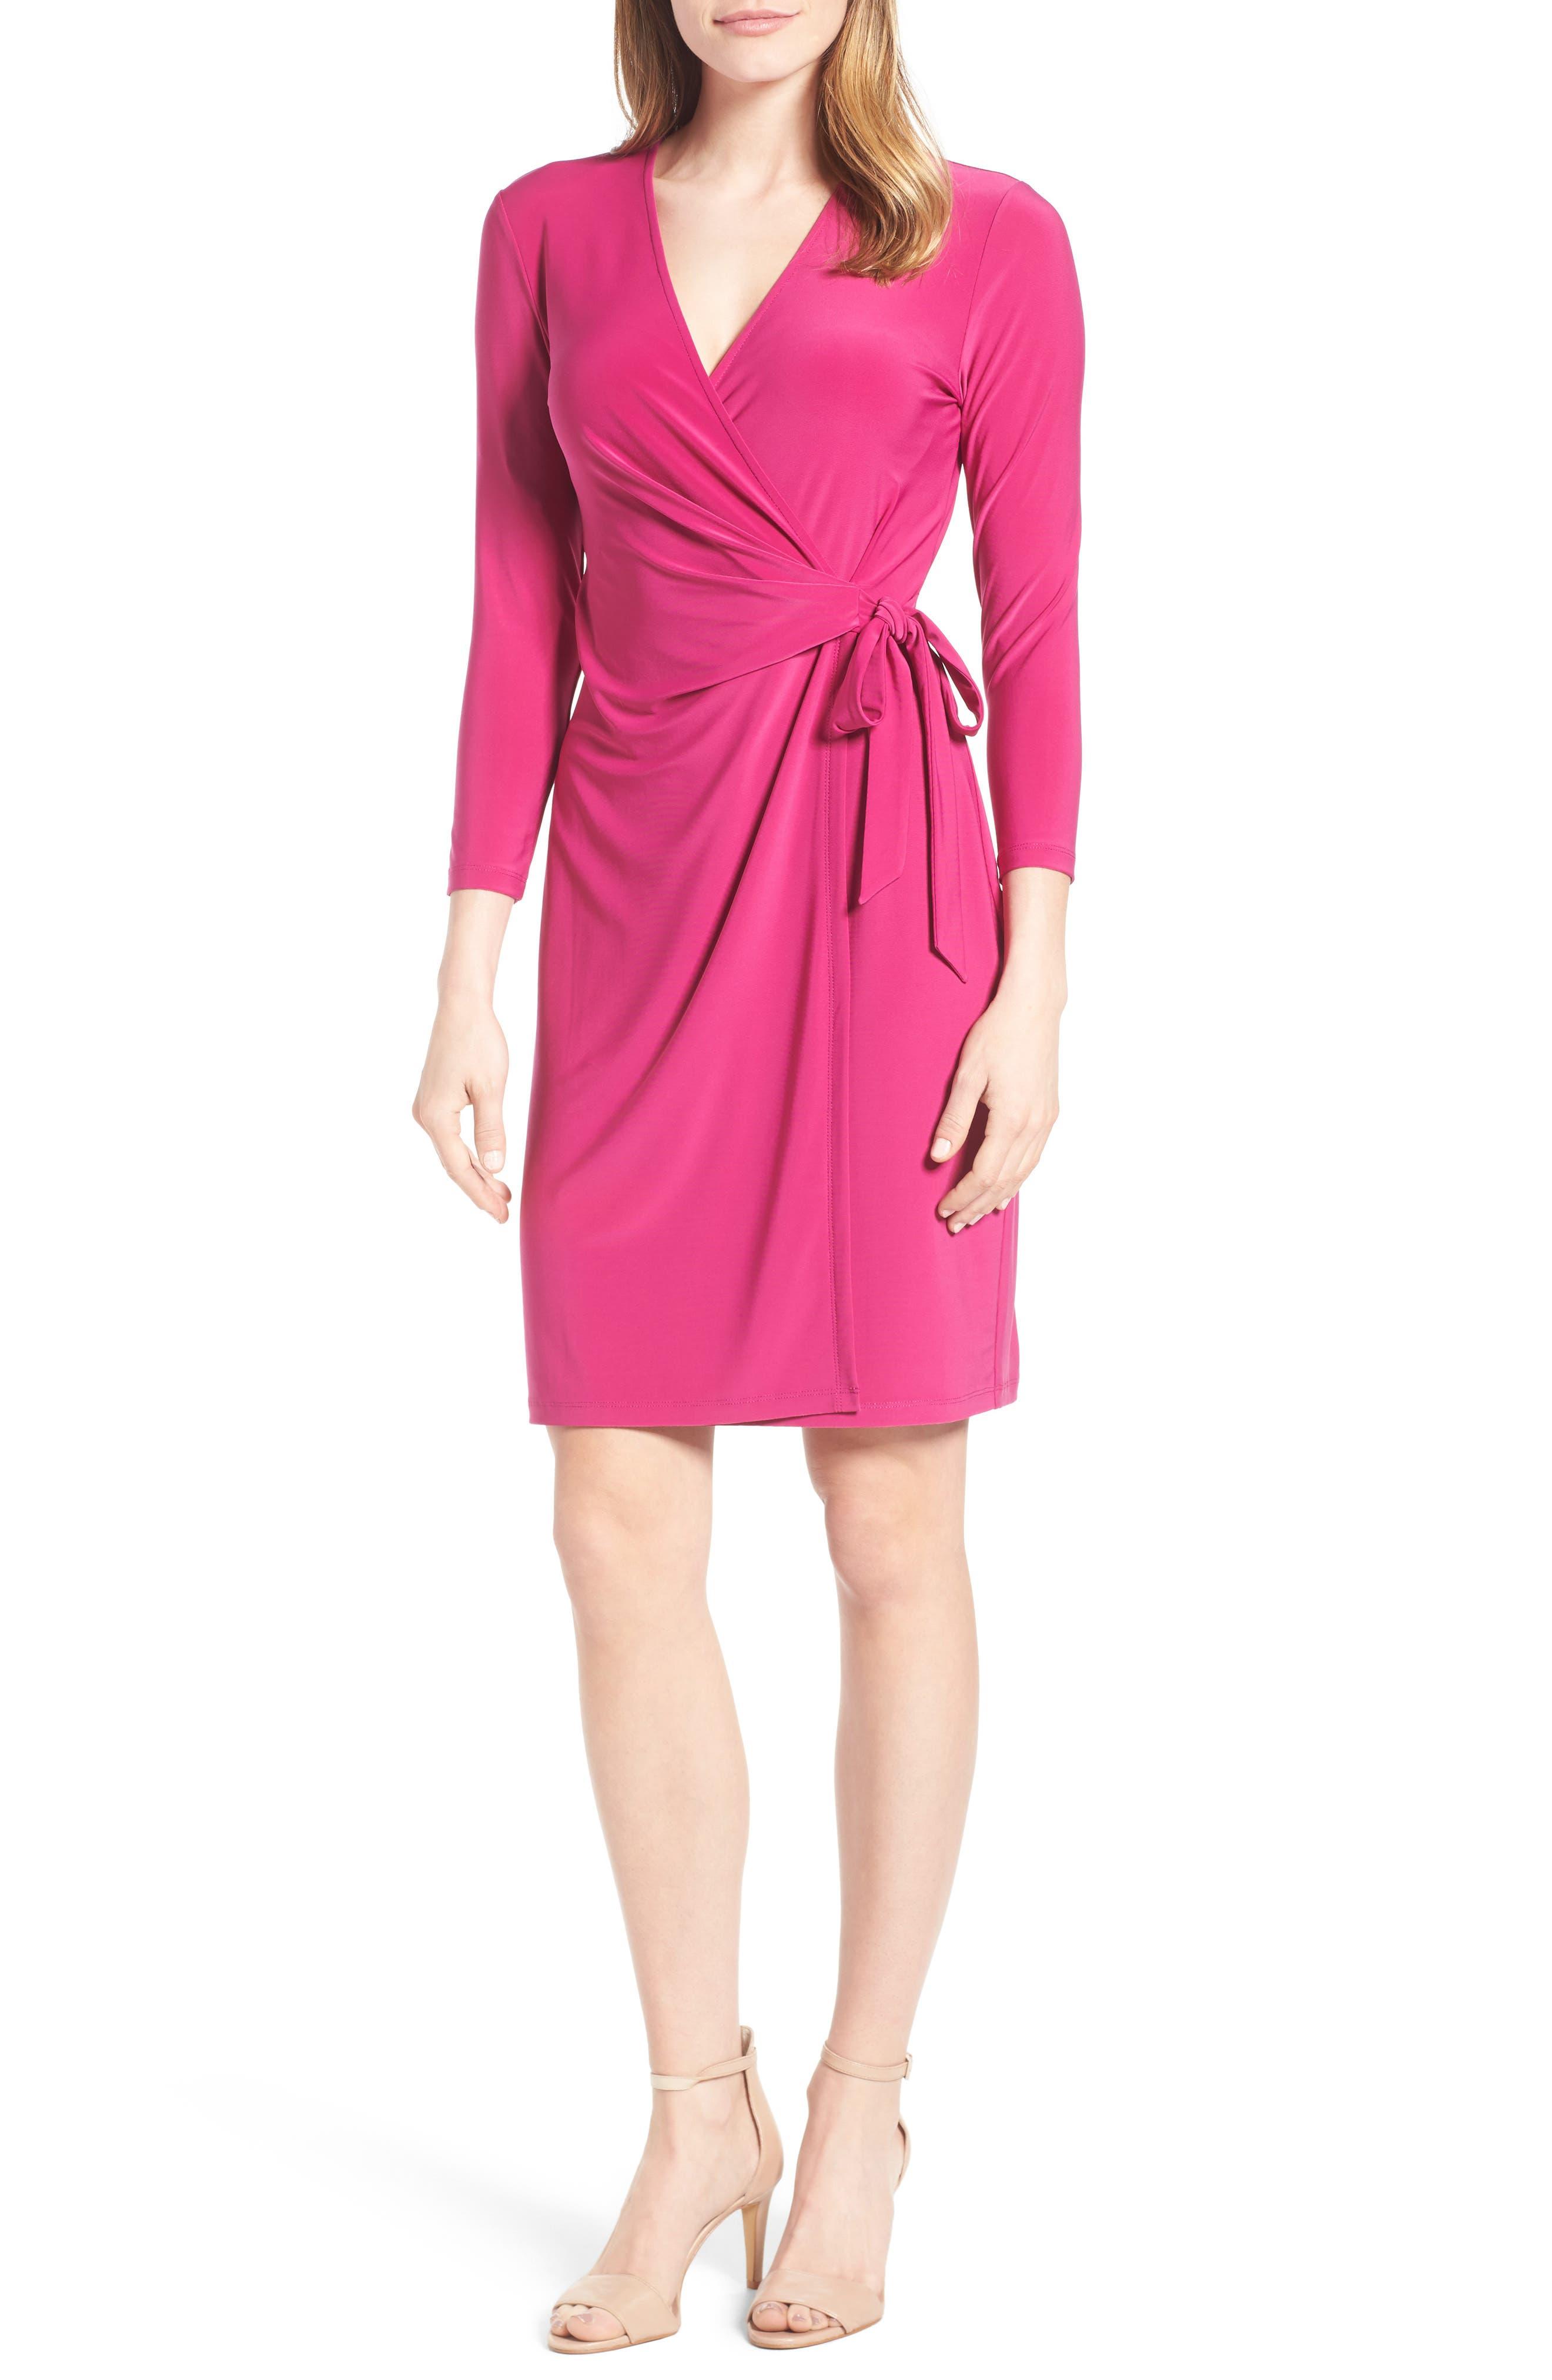 Anne Klein Stretch Jersey Faux Wrap Dress